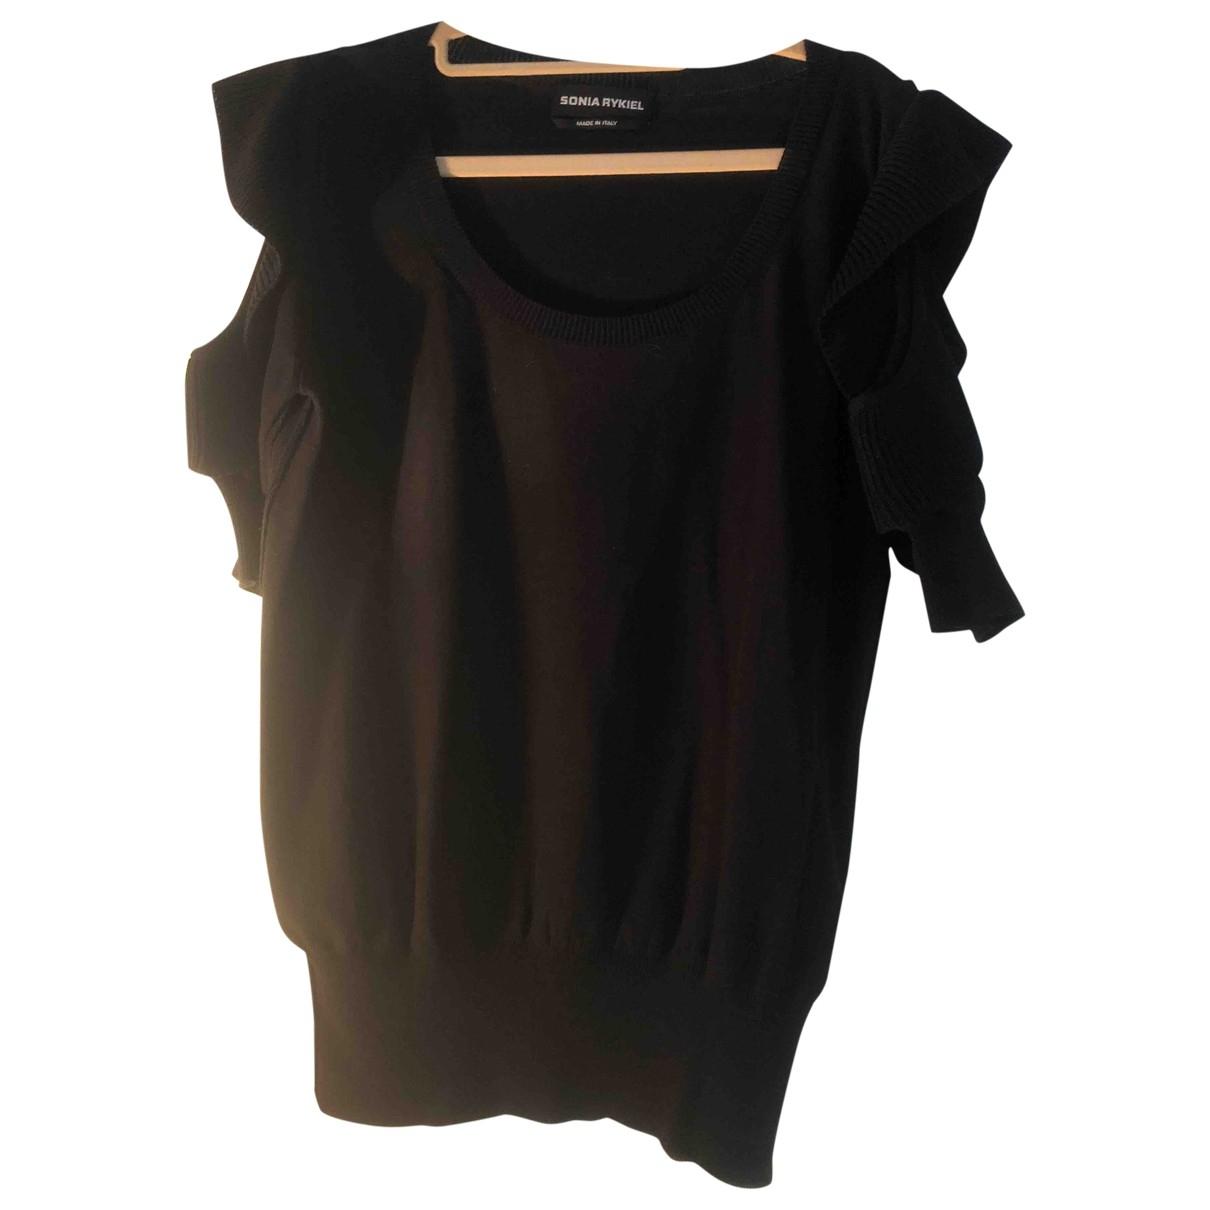 Sonia Rykiel \N Black Cotton  top for Women 42 FR